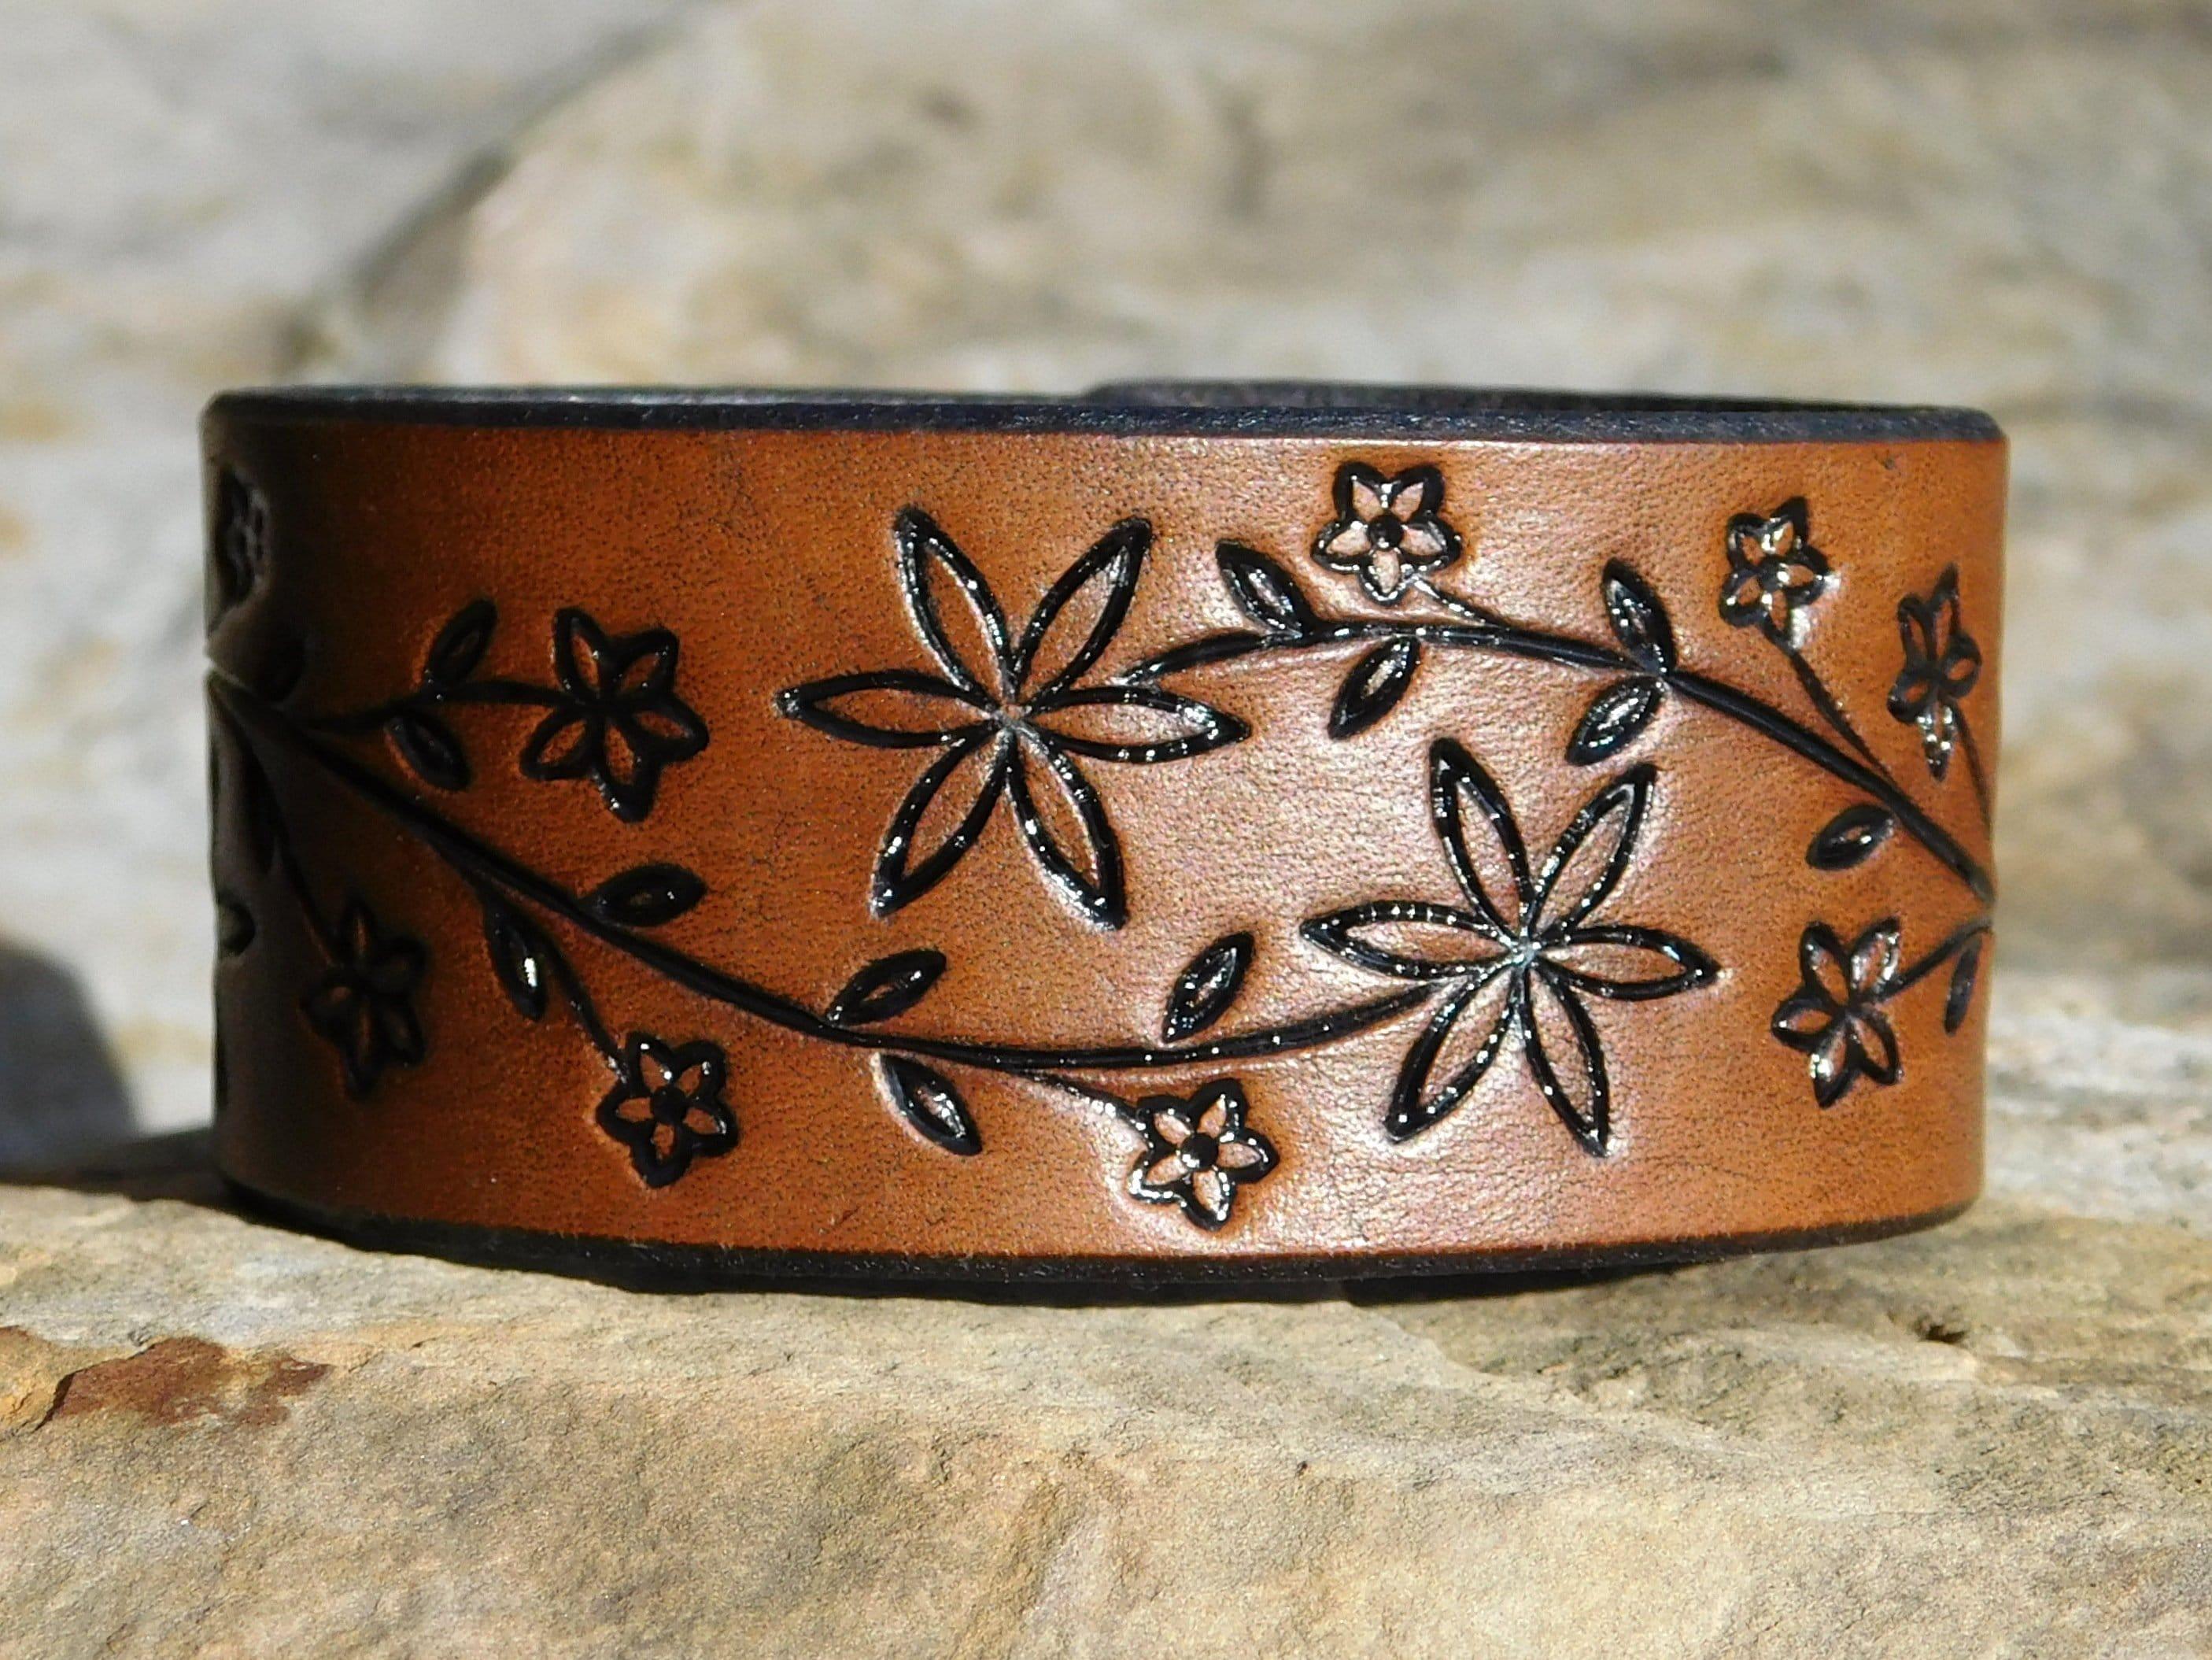 Leather Wristband Bracelet Women Womens leather bracelet Cuff Gift for Her Womens Leather Bracelet Sunflower Daisy Vine 3rd Anniversary